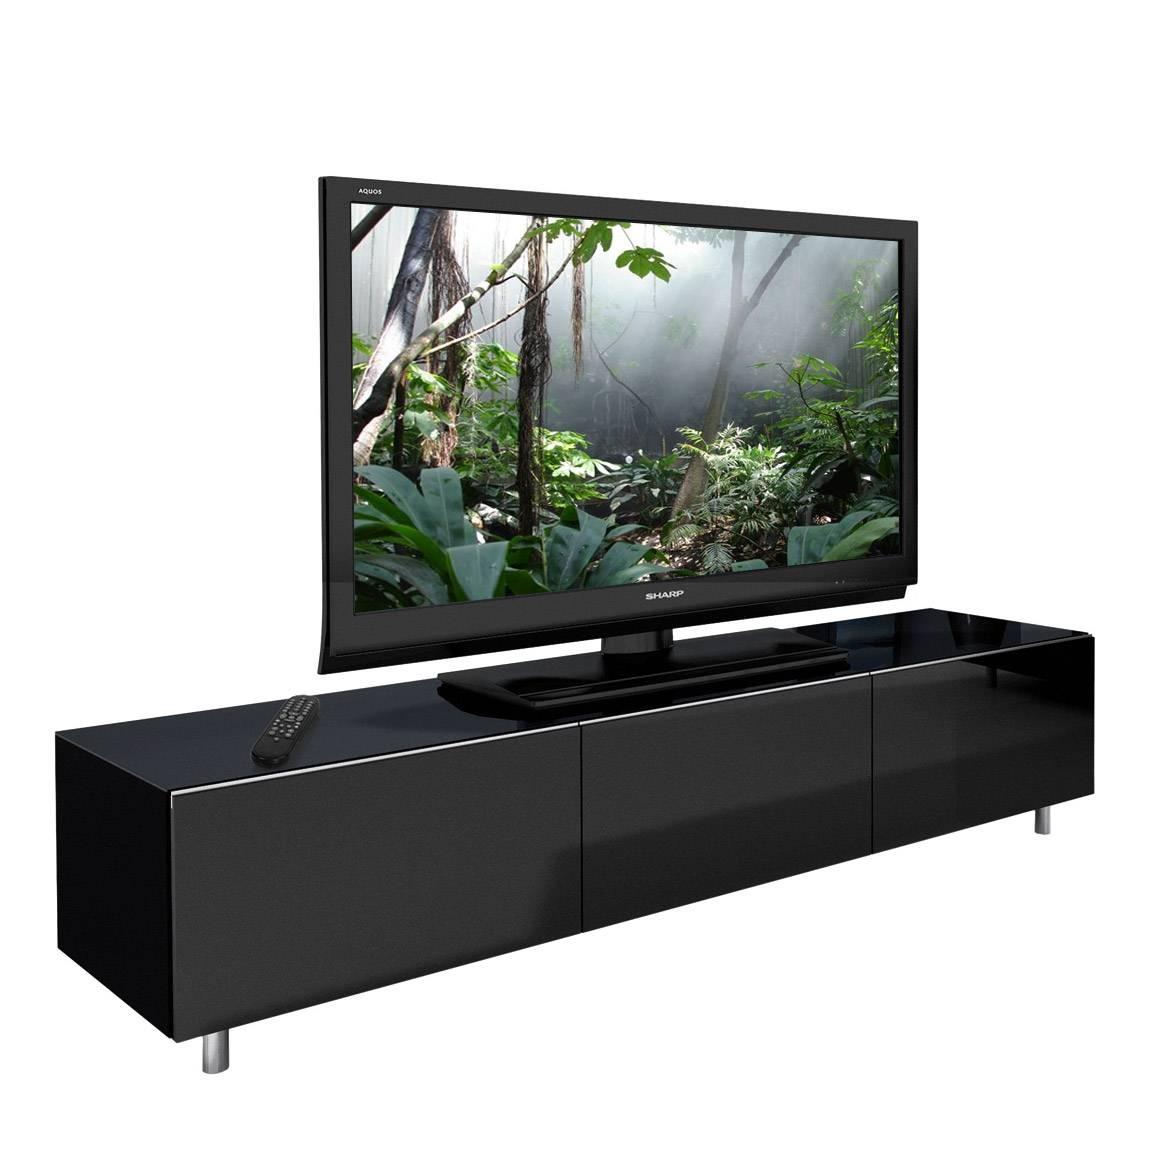 Spectral Just-Racks Jrl1650S Gloss Black Tv Cabinet - Just-Racks with Shiny Black Tv Stands (Image 10 of 15)